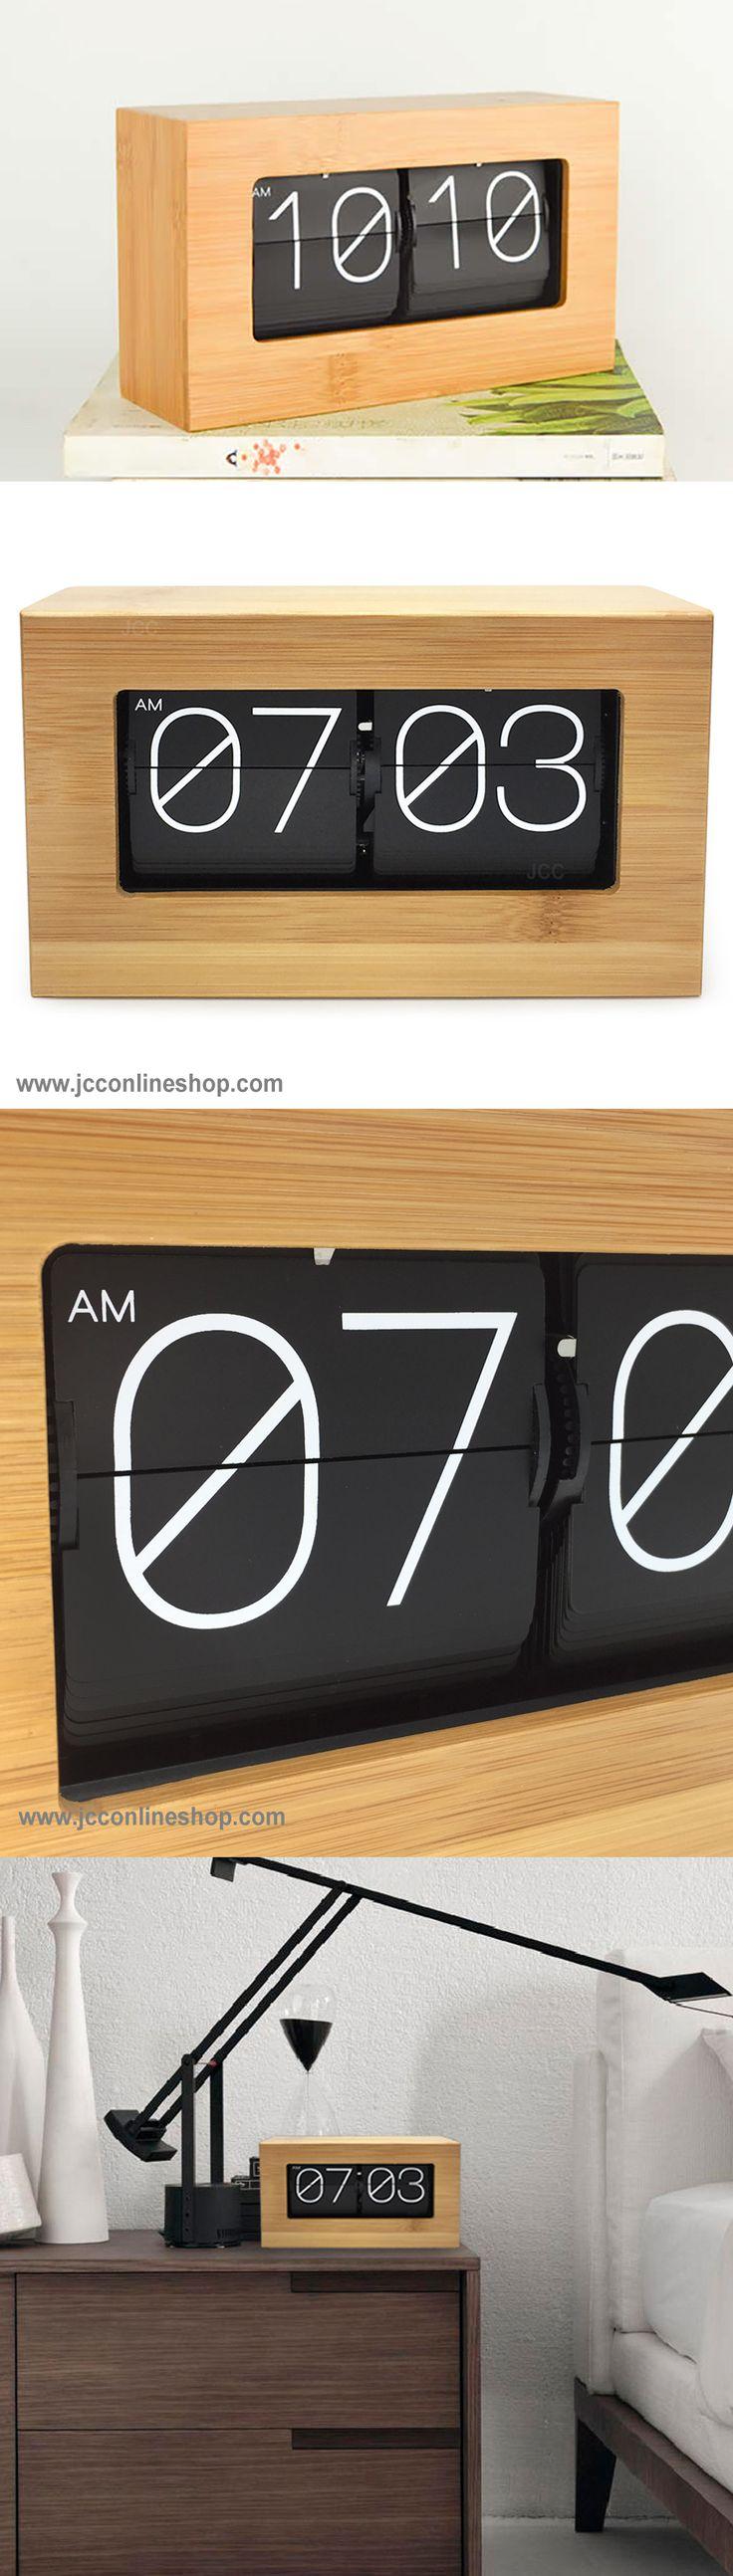 JCC Bamboo Large Number Retro Auto Flip Down Desk Wall clock  www.jcconlineshop.com  #jcc #flip #clock #classic #bamboo #retro #time #home